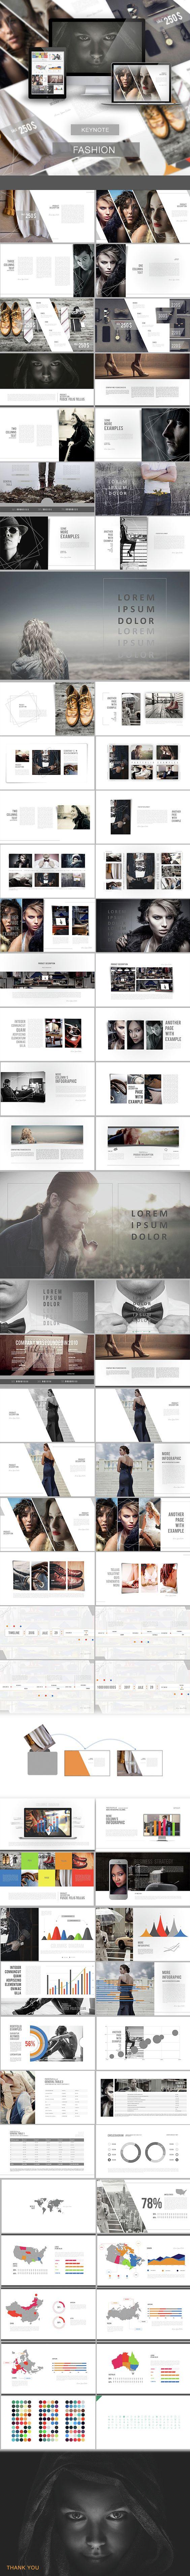 Fashion - Keynote Presentation Template. Download here: http://graphicriver.net/item/fashion/15077359?ref=ksioks